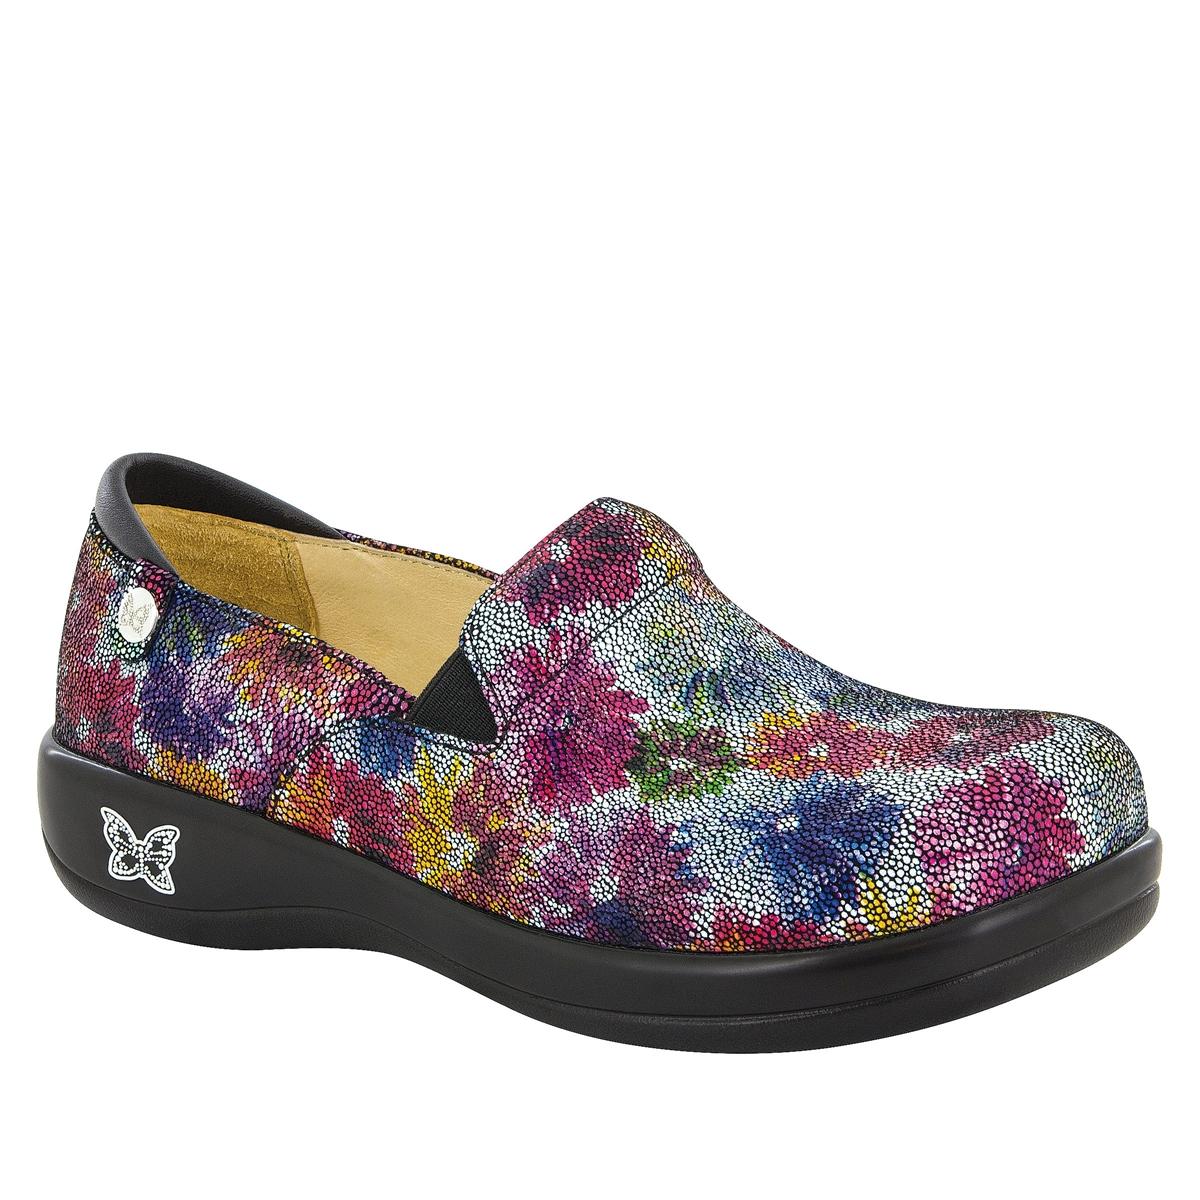 Nurse Alegria Keli Pro Bloomies Shoes Help Your Comfort